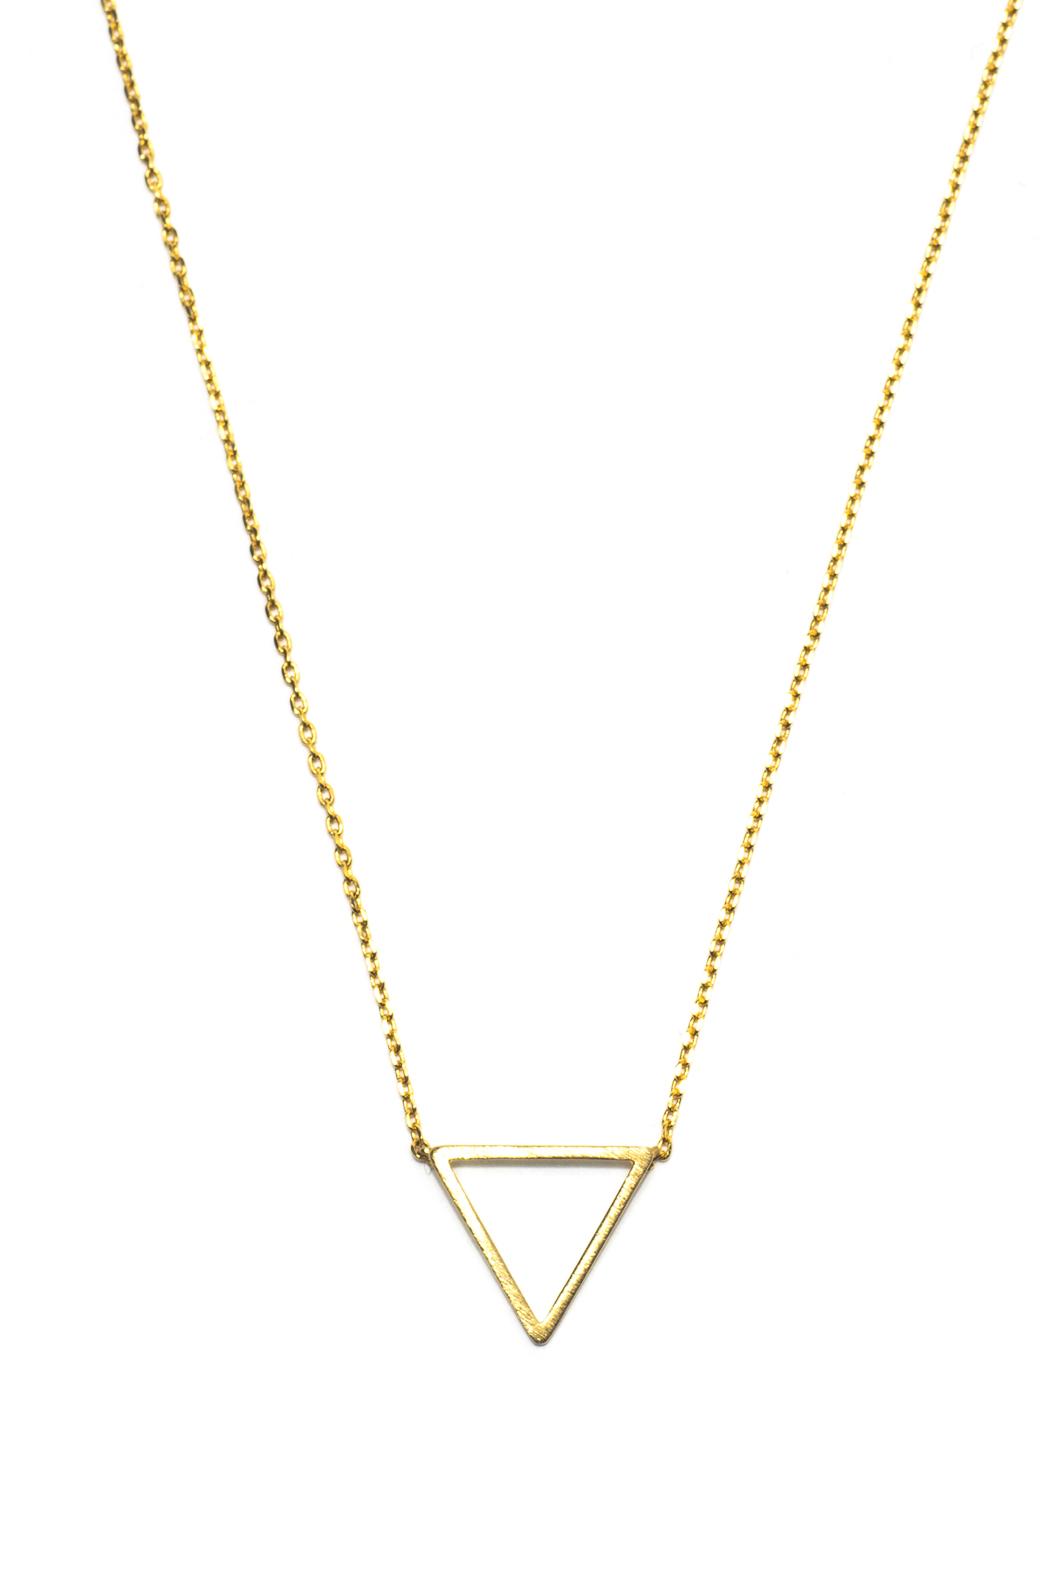 chevron necklace gold.jpg